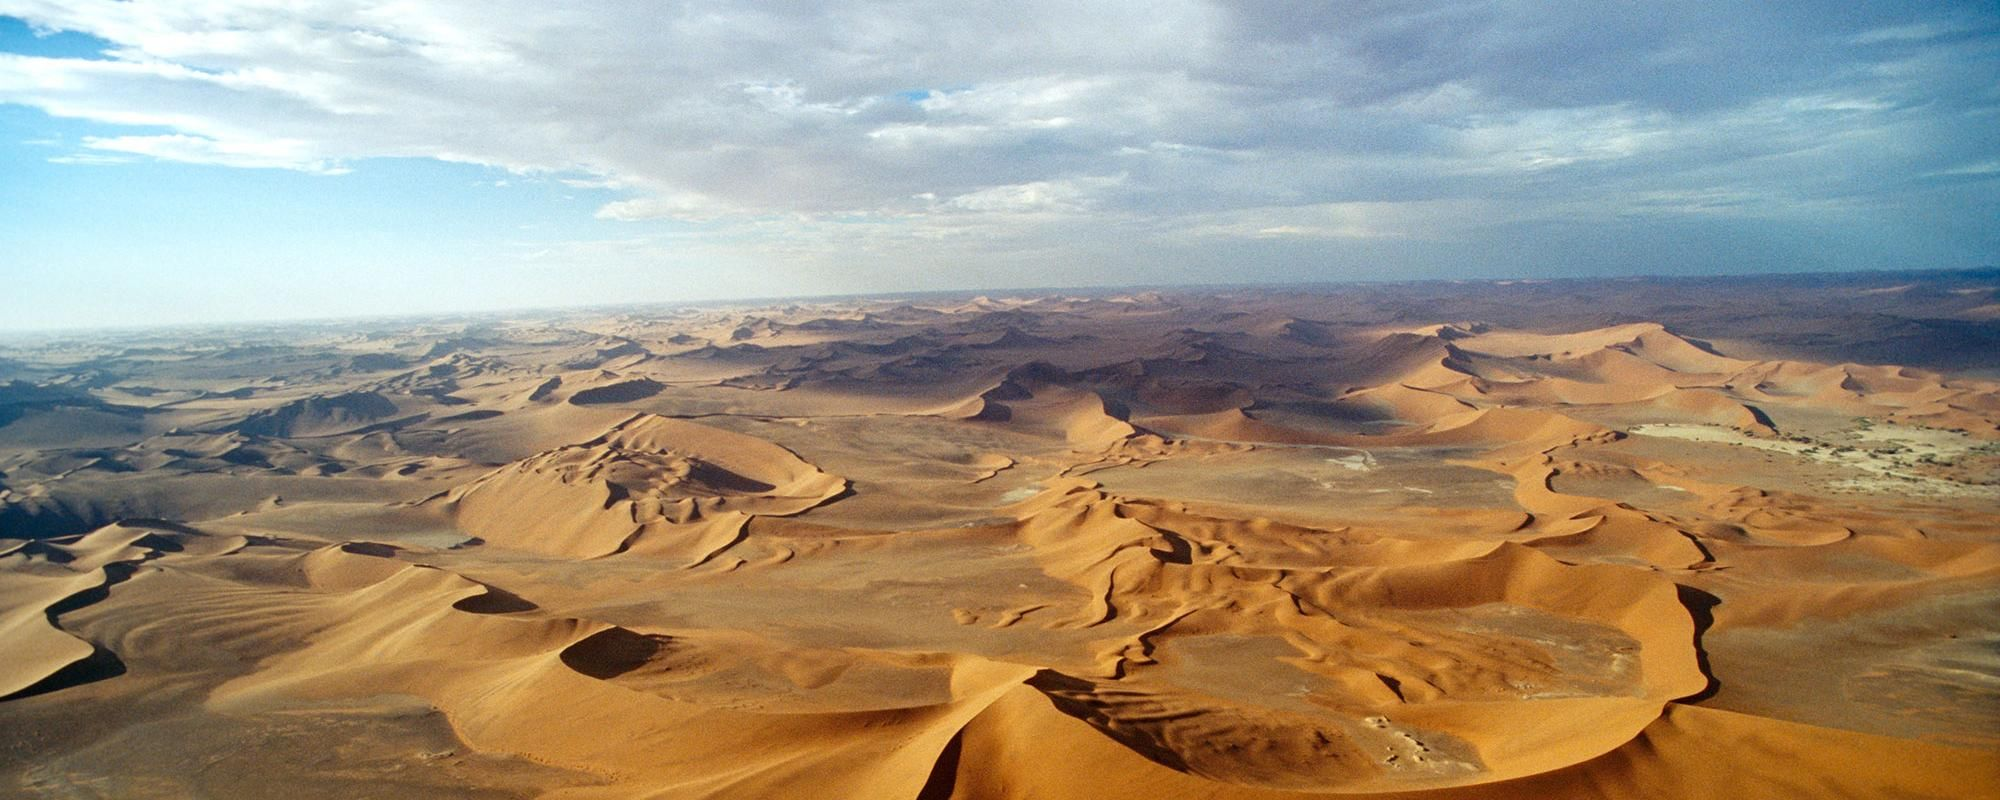 http://www.tcsworldtravel.com/sites/default/files/styles/grid_hero_desktop_1x/public/imce/Destinations/Namibia/Namib_Desert/HRO_B0TCE4.jpg?itok=sLA4uakj